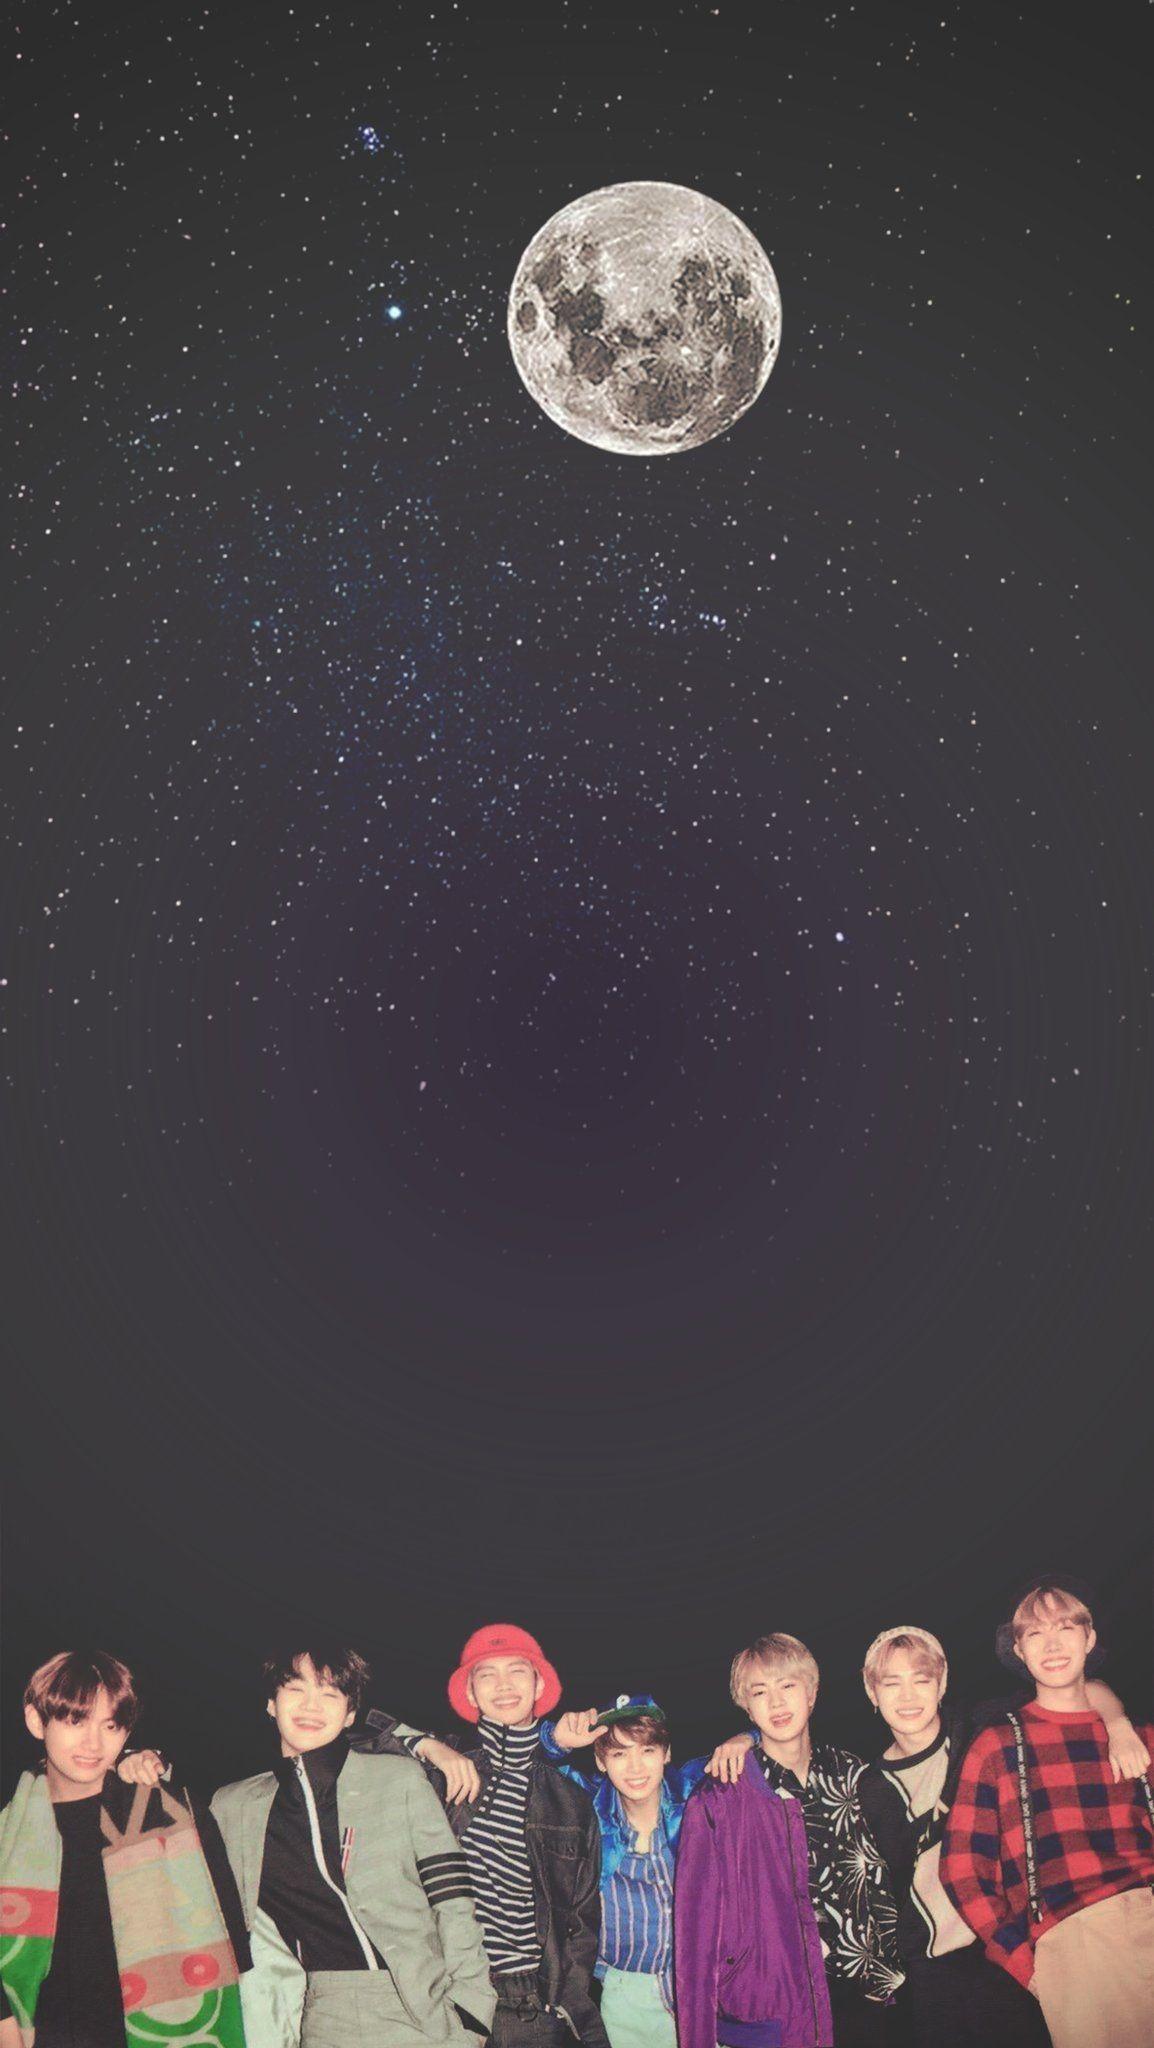 Lock Screen Star Wars Aesthetic Wallpaper